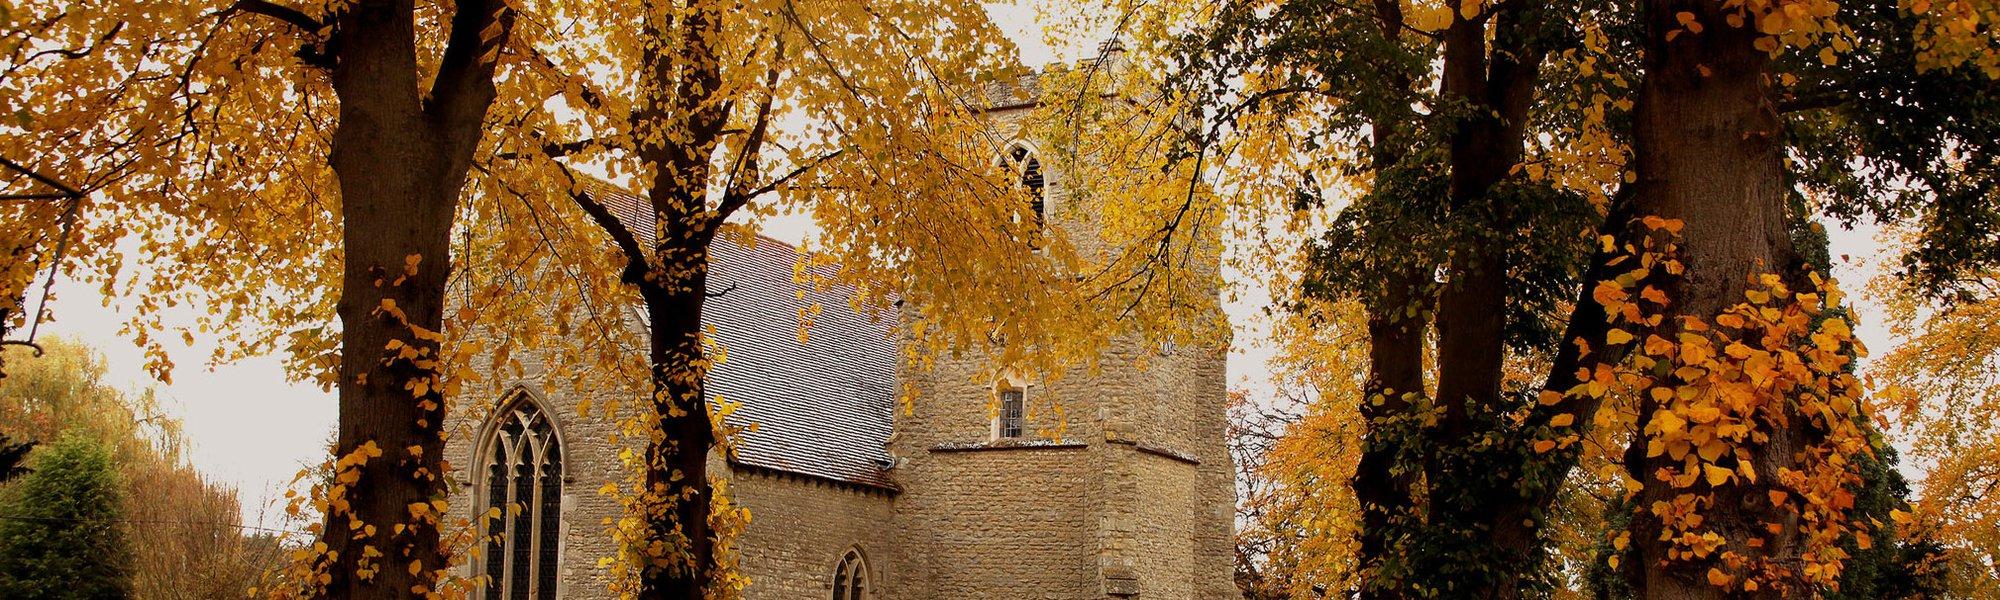 St Catherine's Church, Towersey